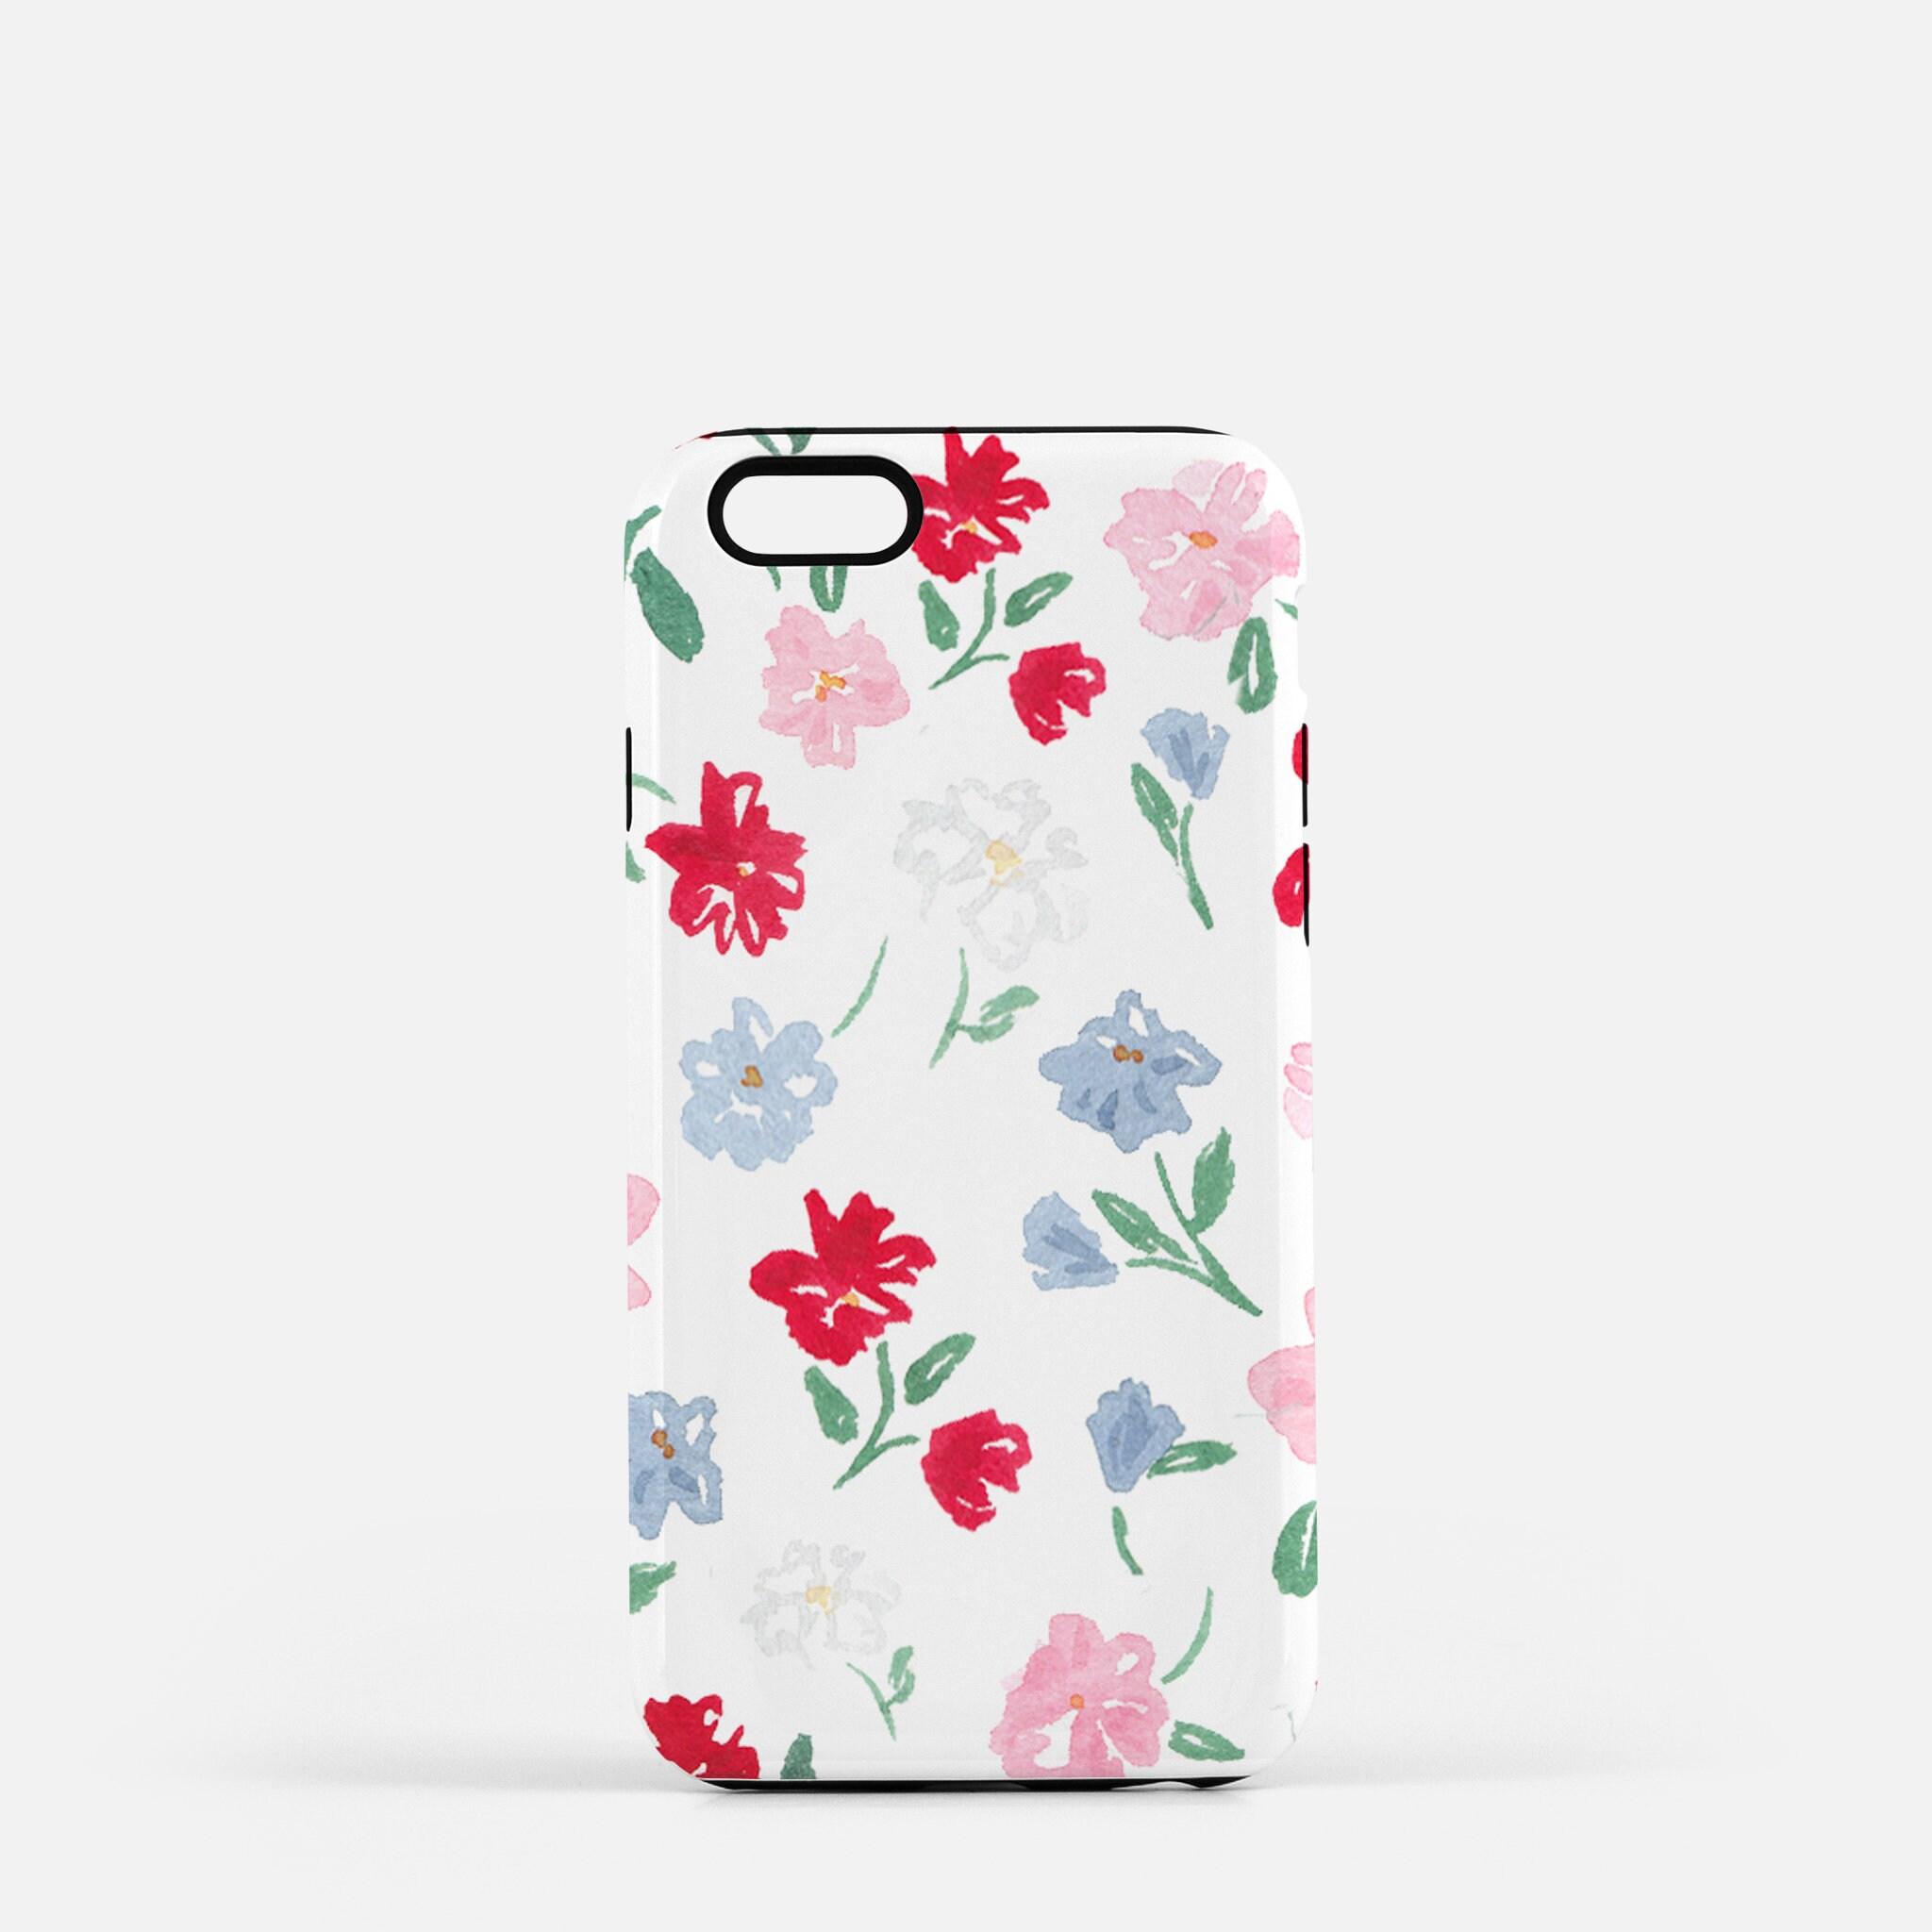 huge discount 1a3d5 f13ea Phone Case - Floral Phone Case, Cute Phone Case, Art Phone Case, Flower  Phone Case, Fashion Phone Case, Colorful Floral Art, Cute Floral Art